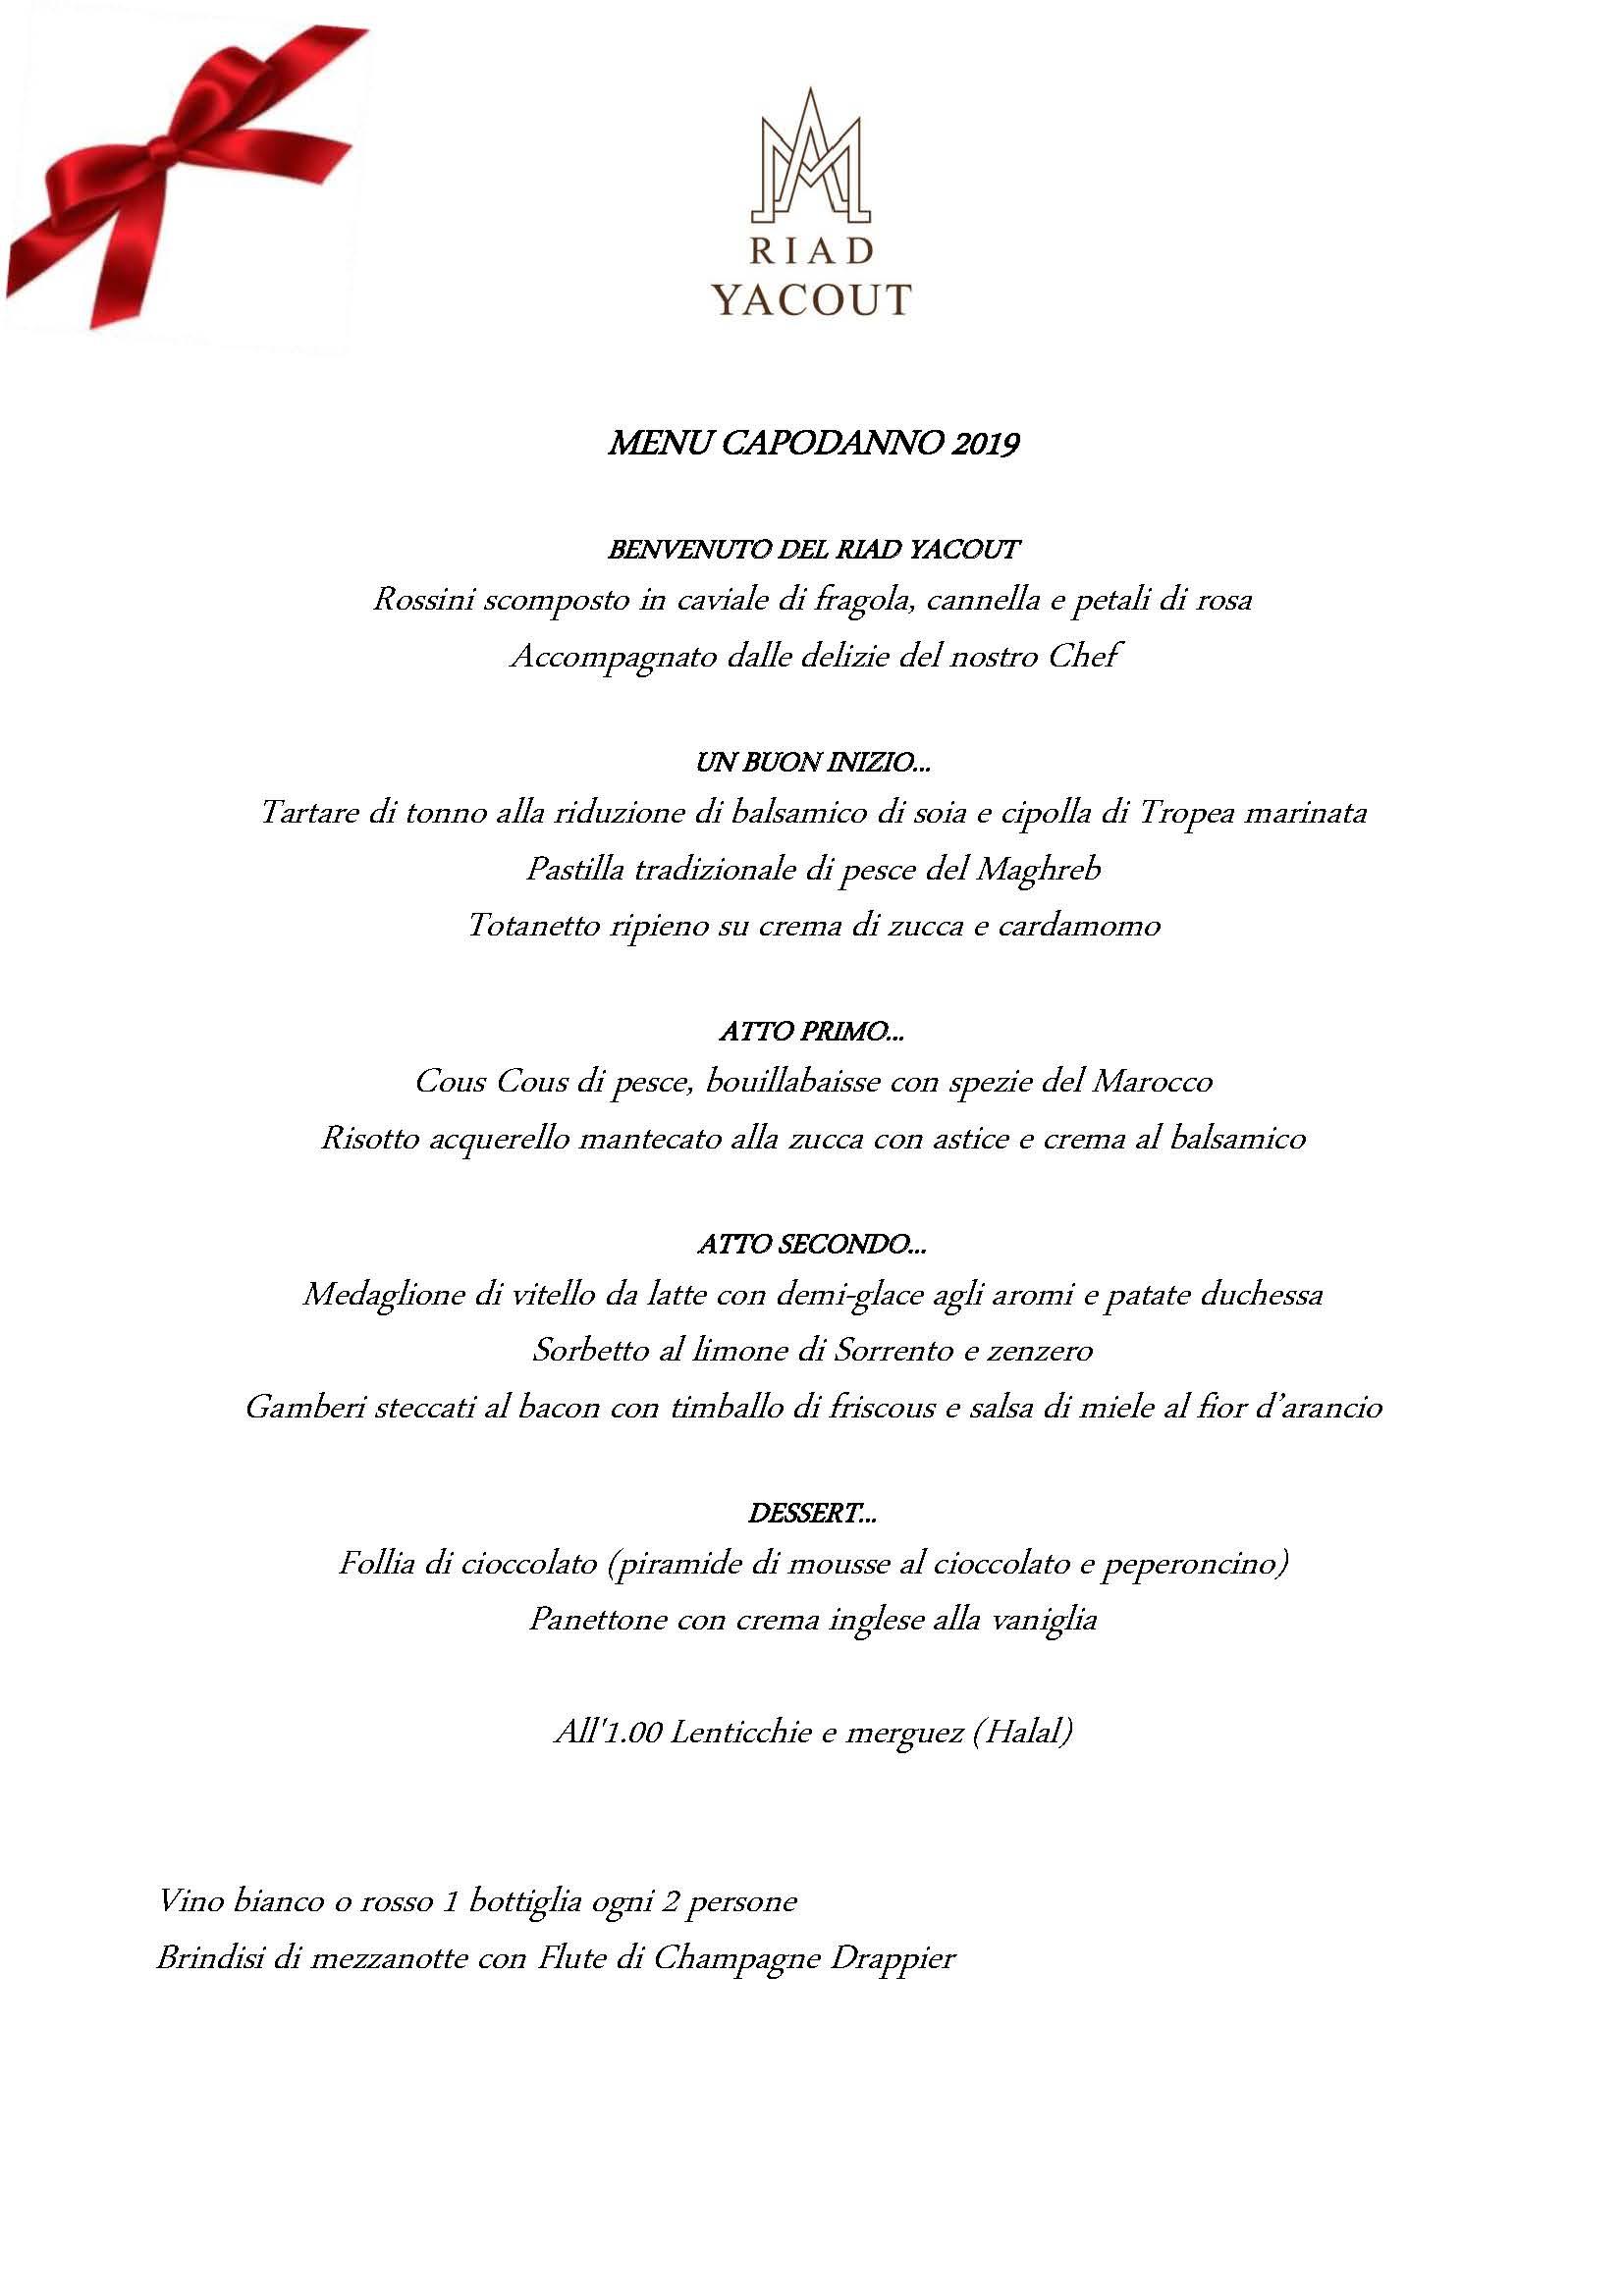 menu-capodanno-2019_pagina_2